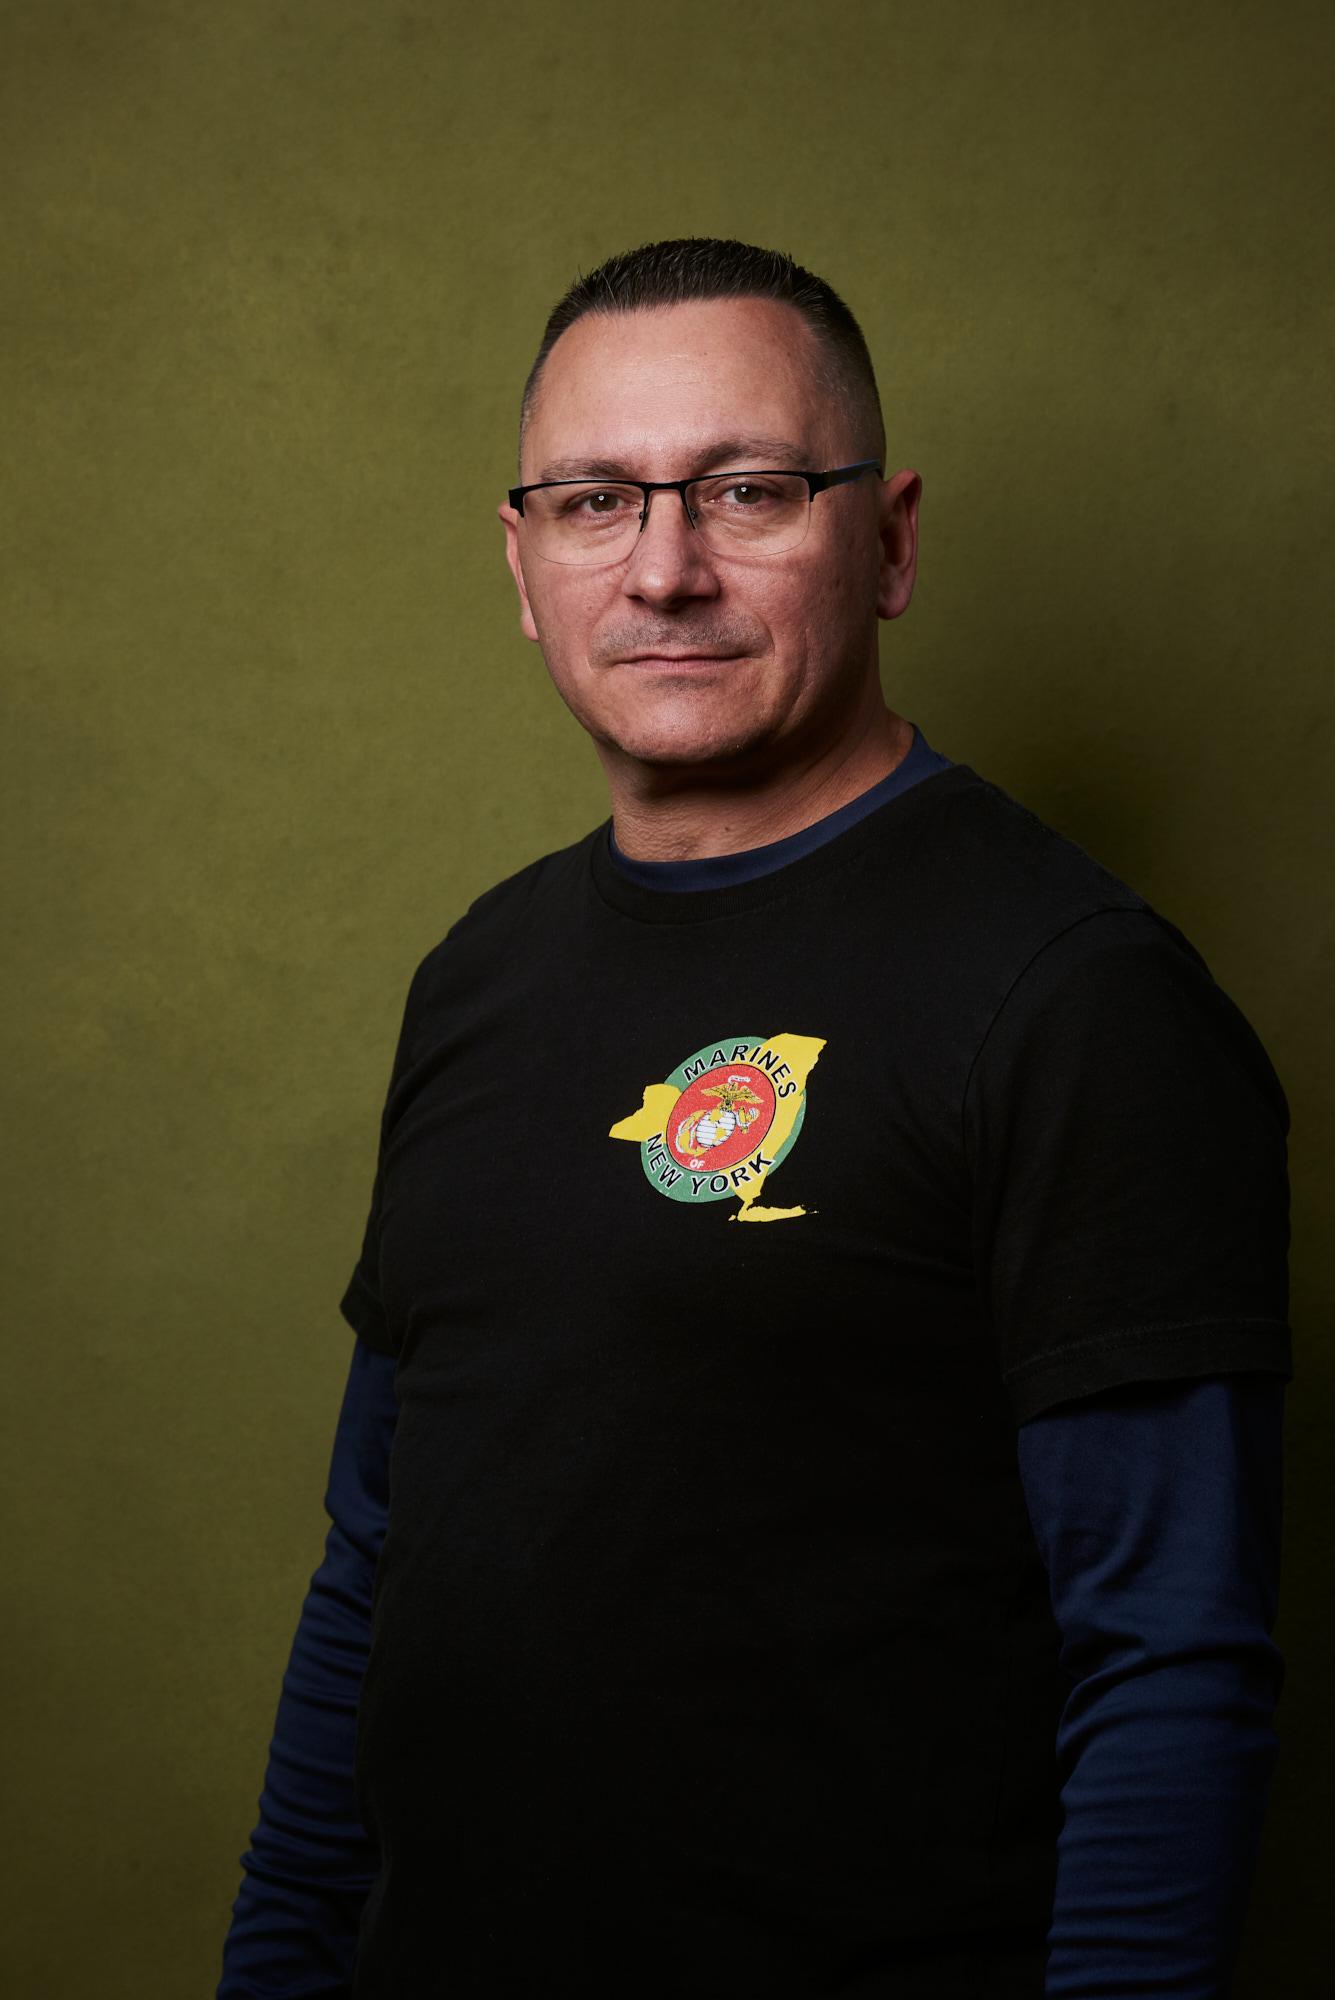 Staff Sergeant Frank Morizio